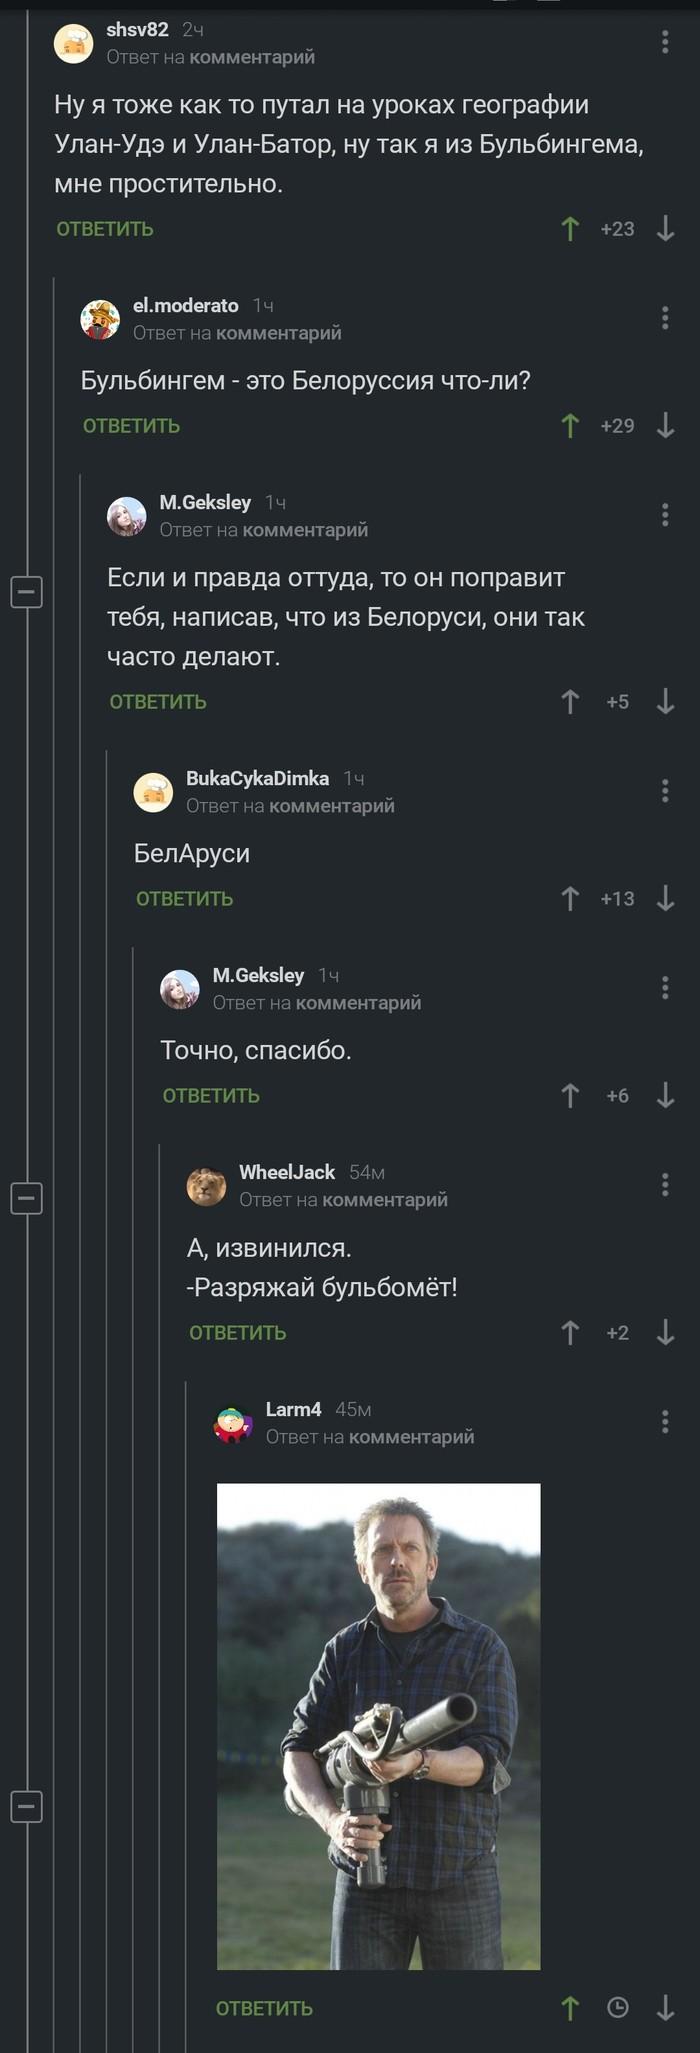 Бульбингем Комментарии на Пикабу, Скриншот, Беларусь, Длиннопост